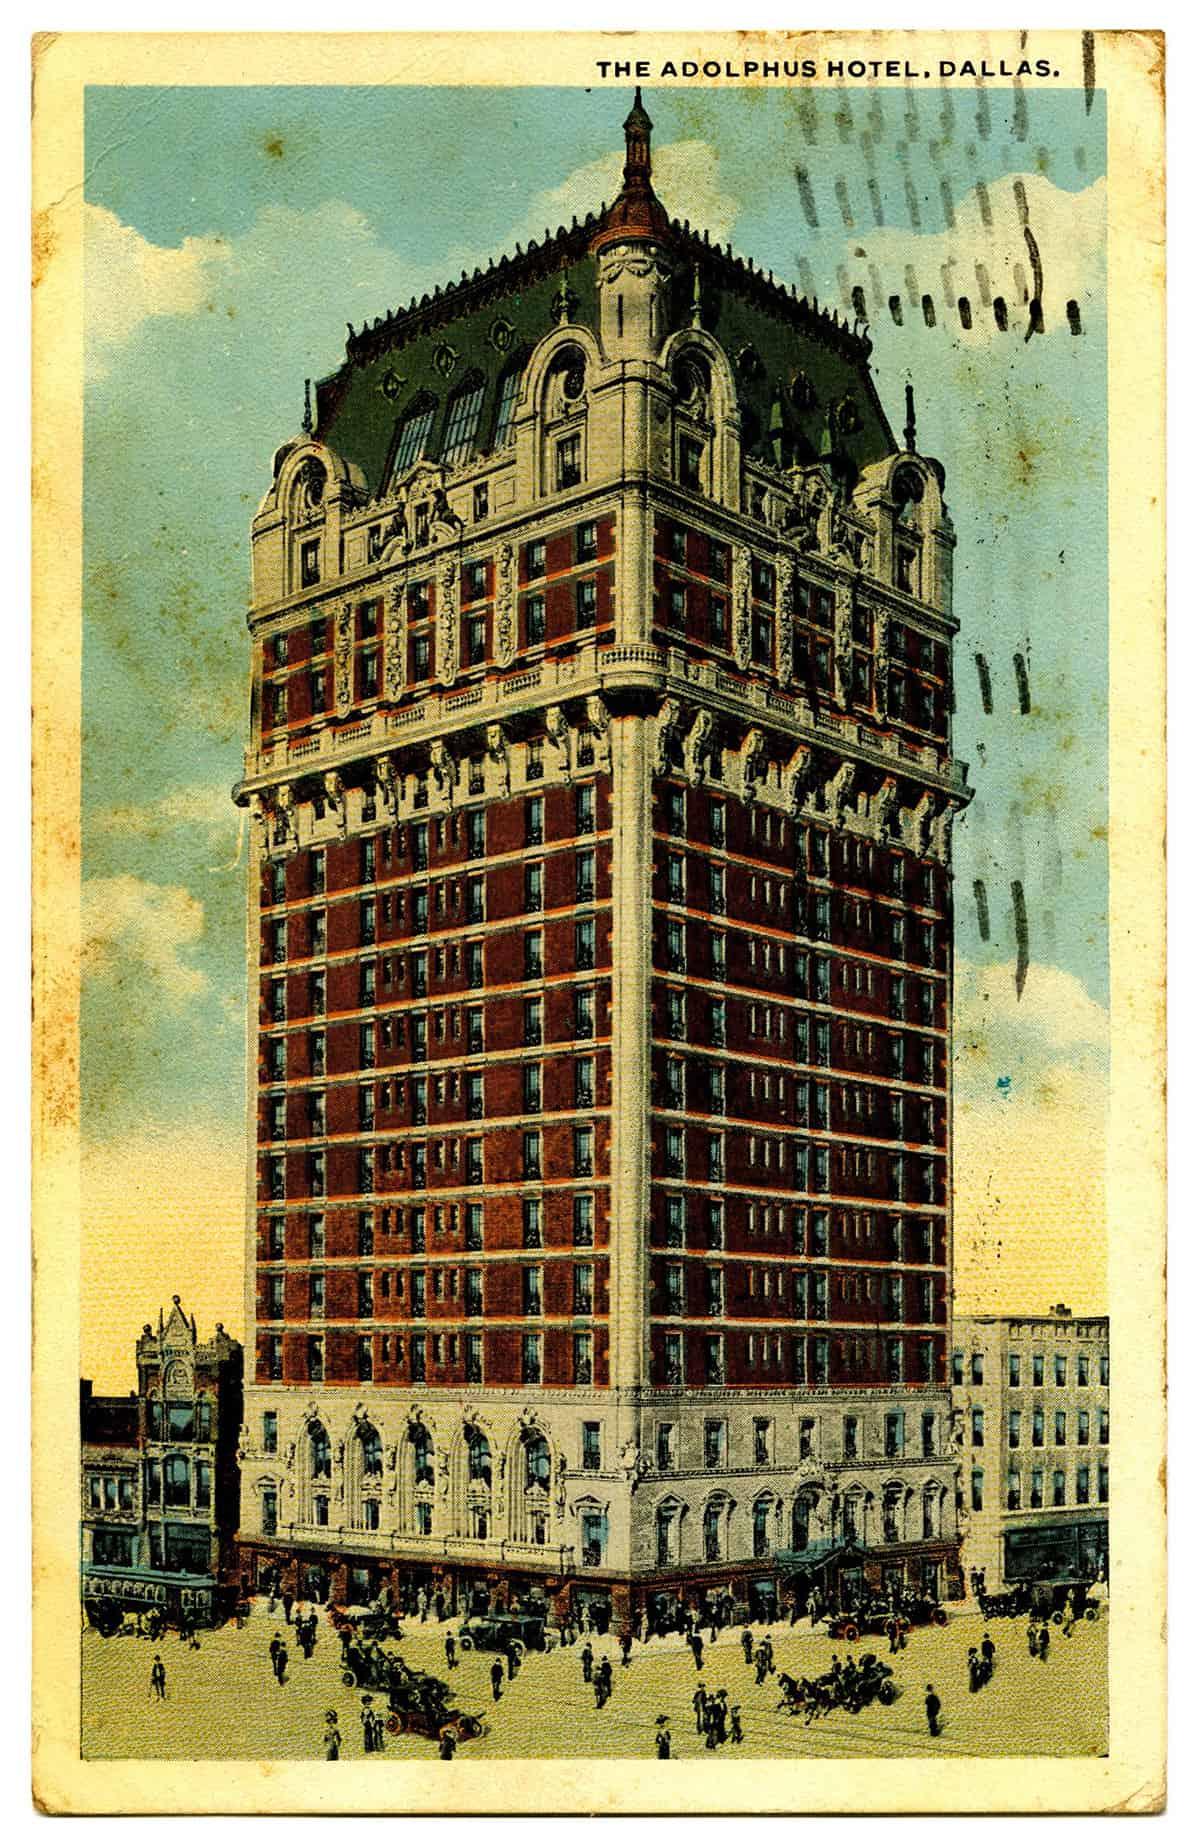 Adolphus Hotel, 1920s. Courtesy of Texas History Handbook